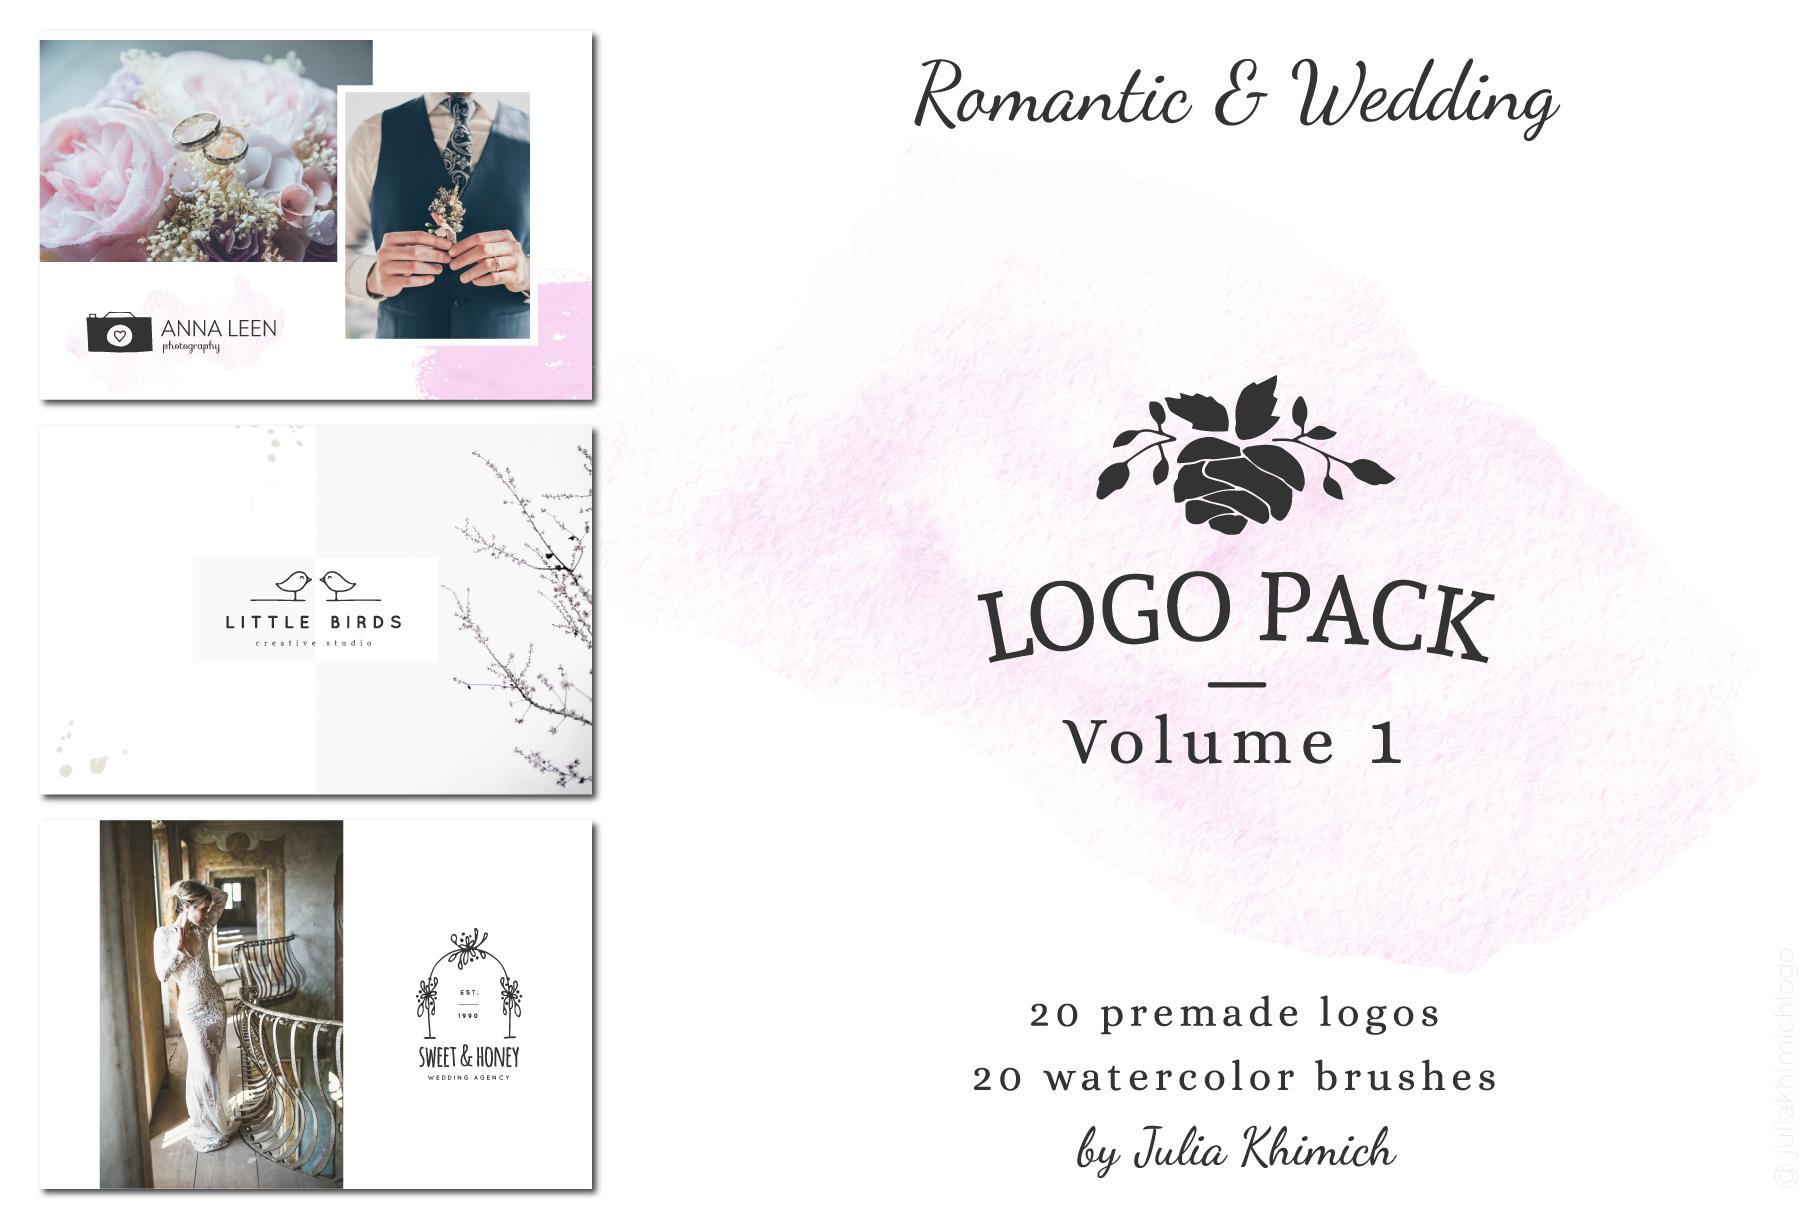 Logo Pack Vol.1. Romantic & Wedding example image 1